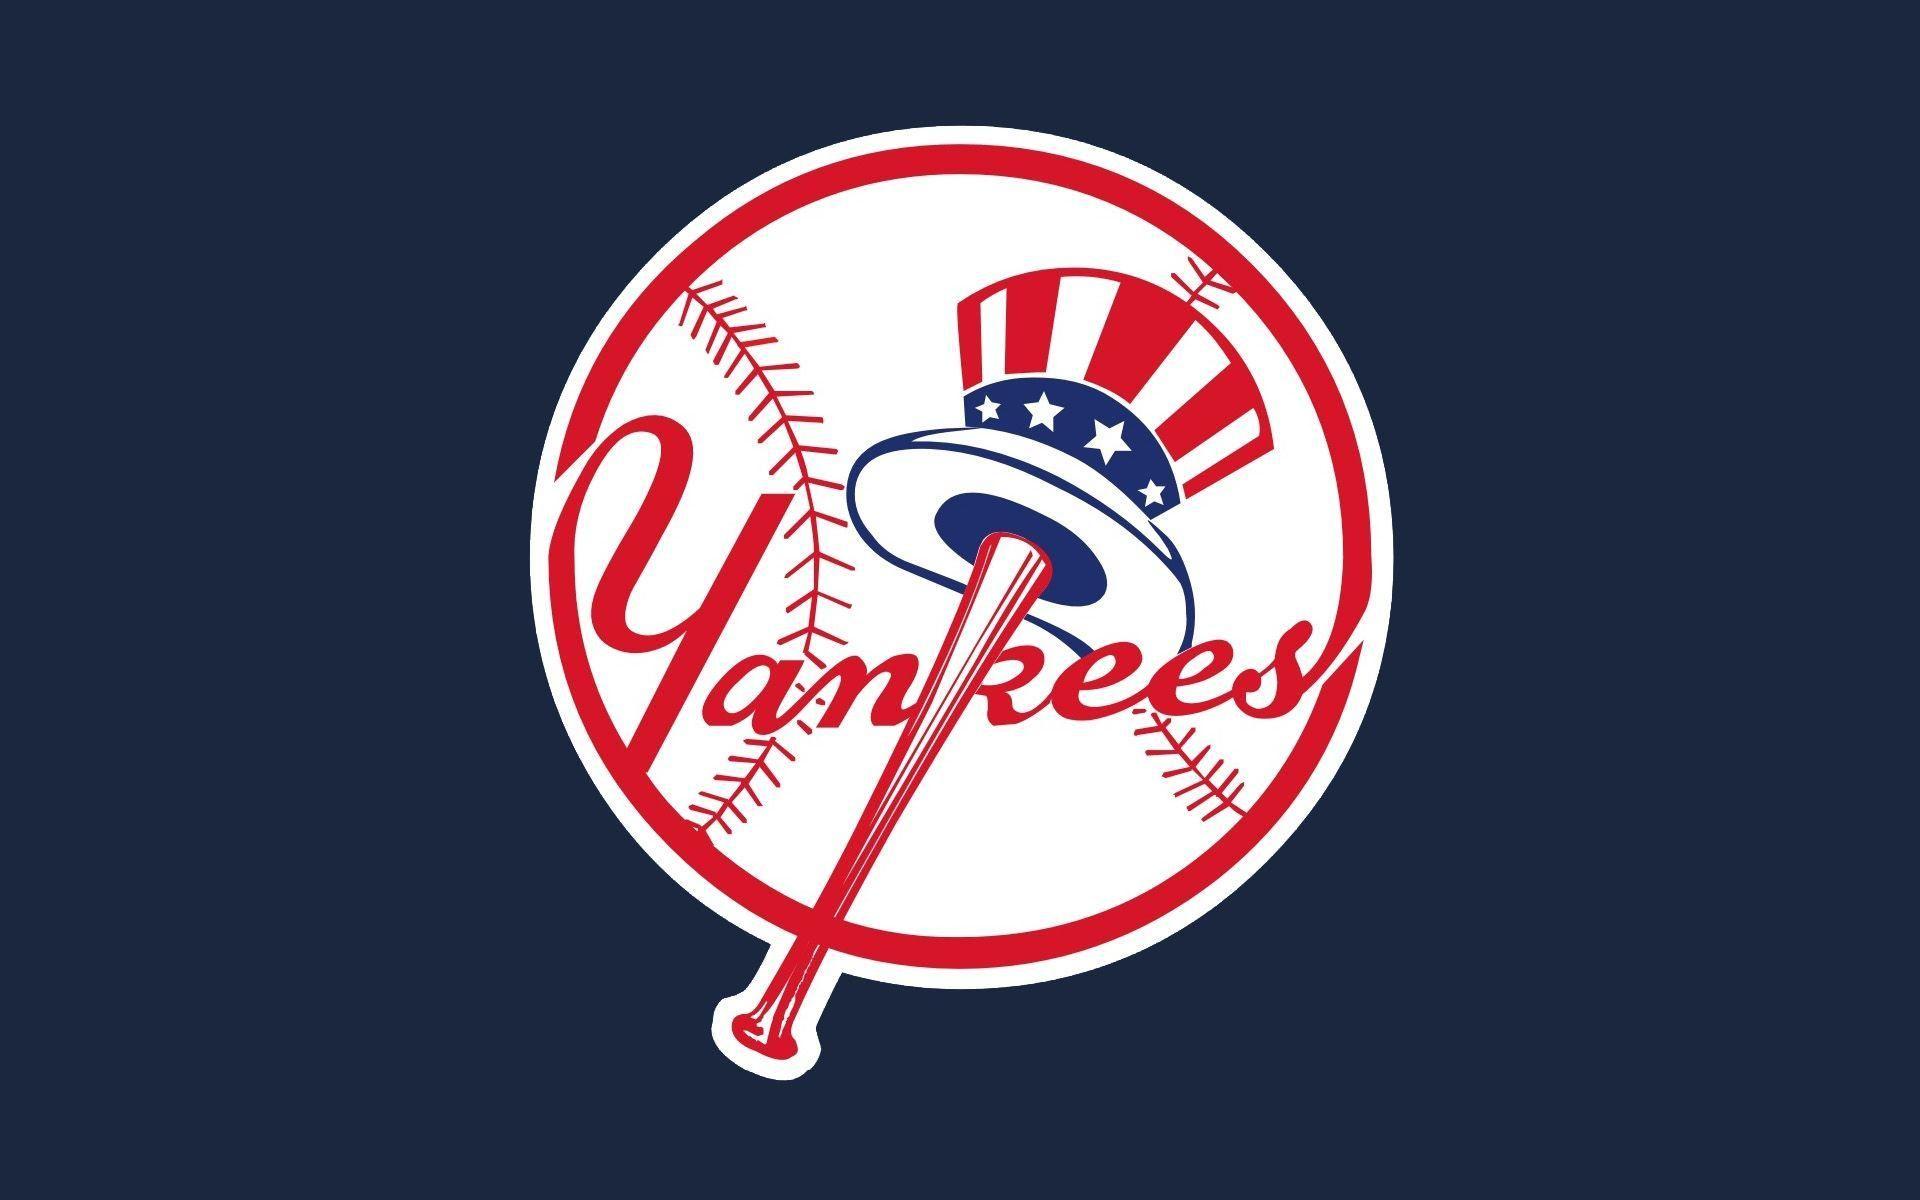 New York Yankees Desktop Wallpaper Wallpapers 2020 Check More At Https 2020wallpapers Club New New York Yankees Logo Yankees Logo New York Yankees Baseball